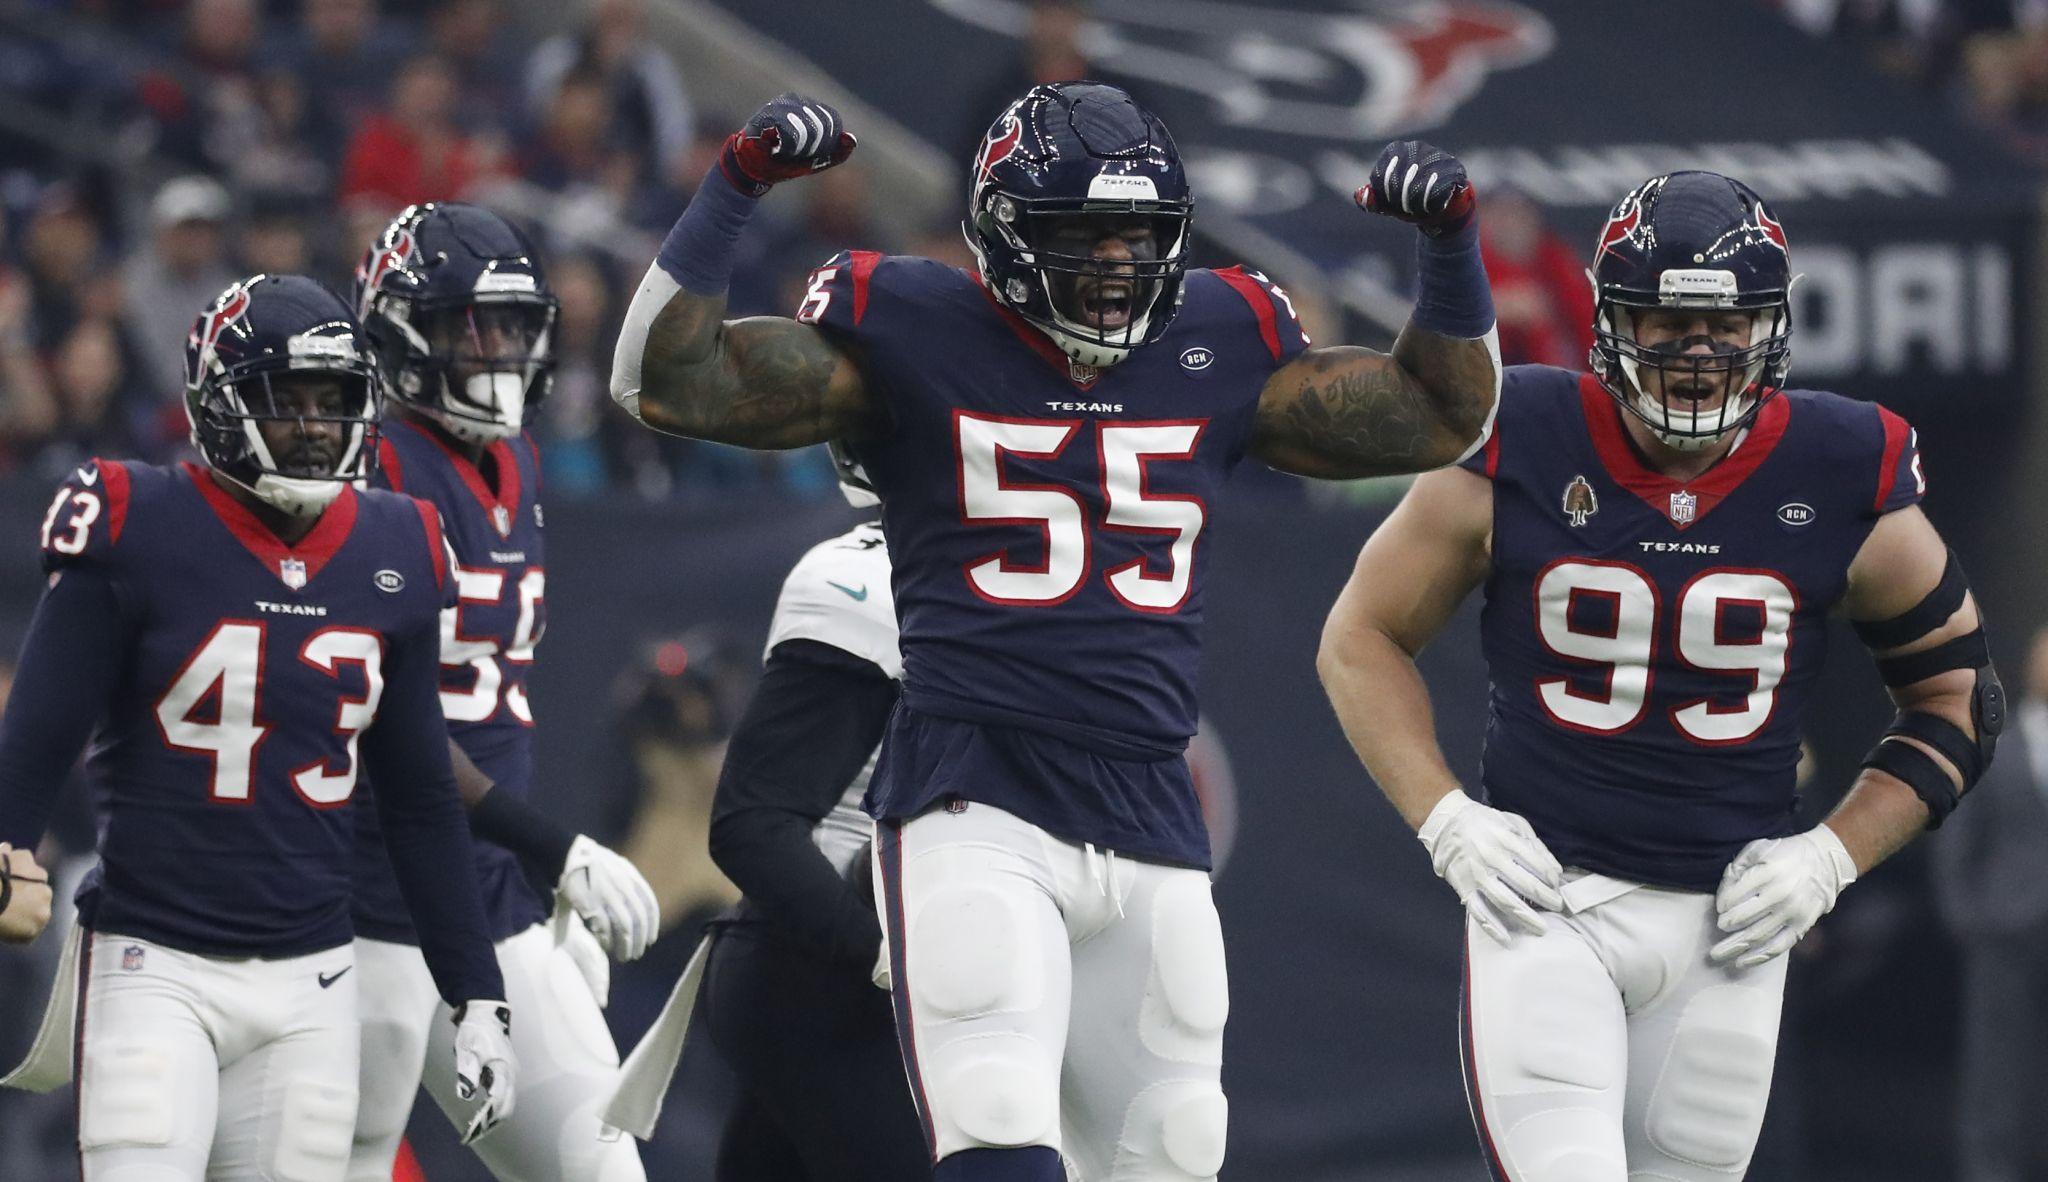 Texans vs. Jaguars: Houston Chronicle staff predictions